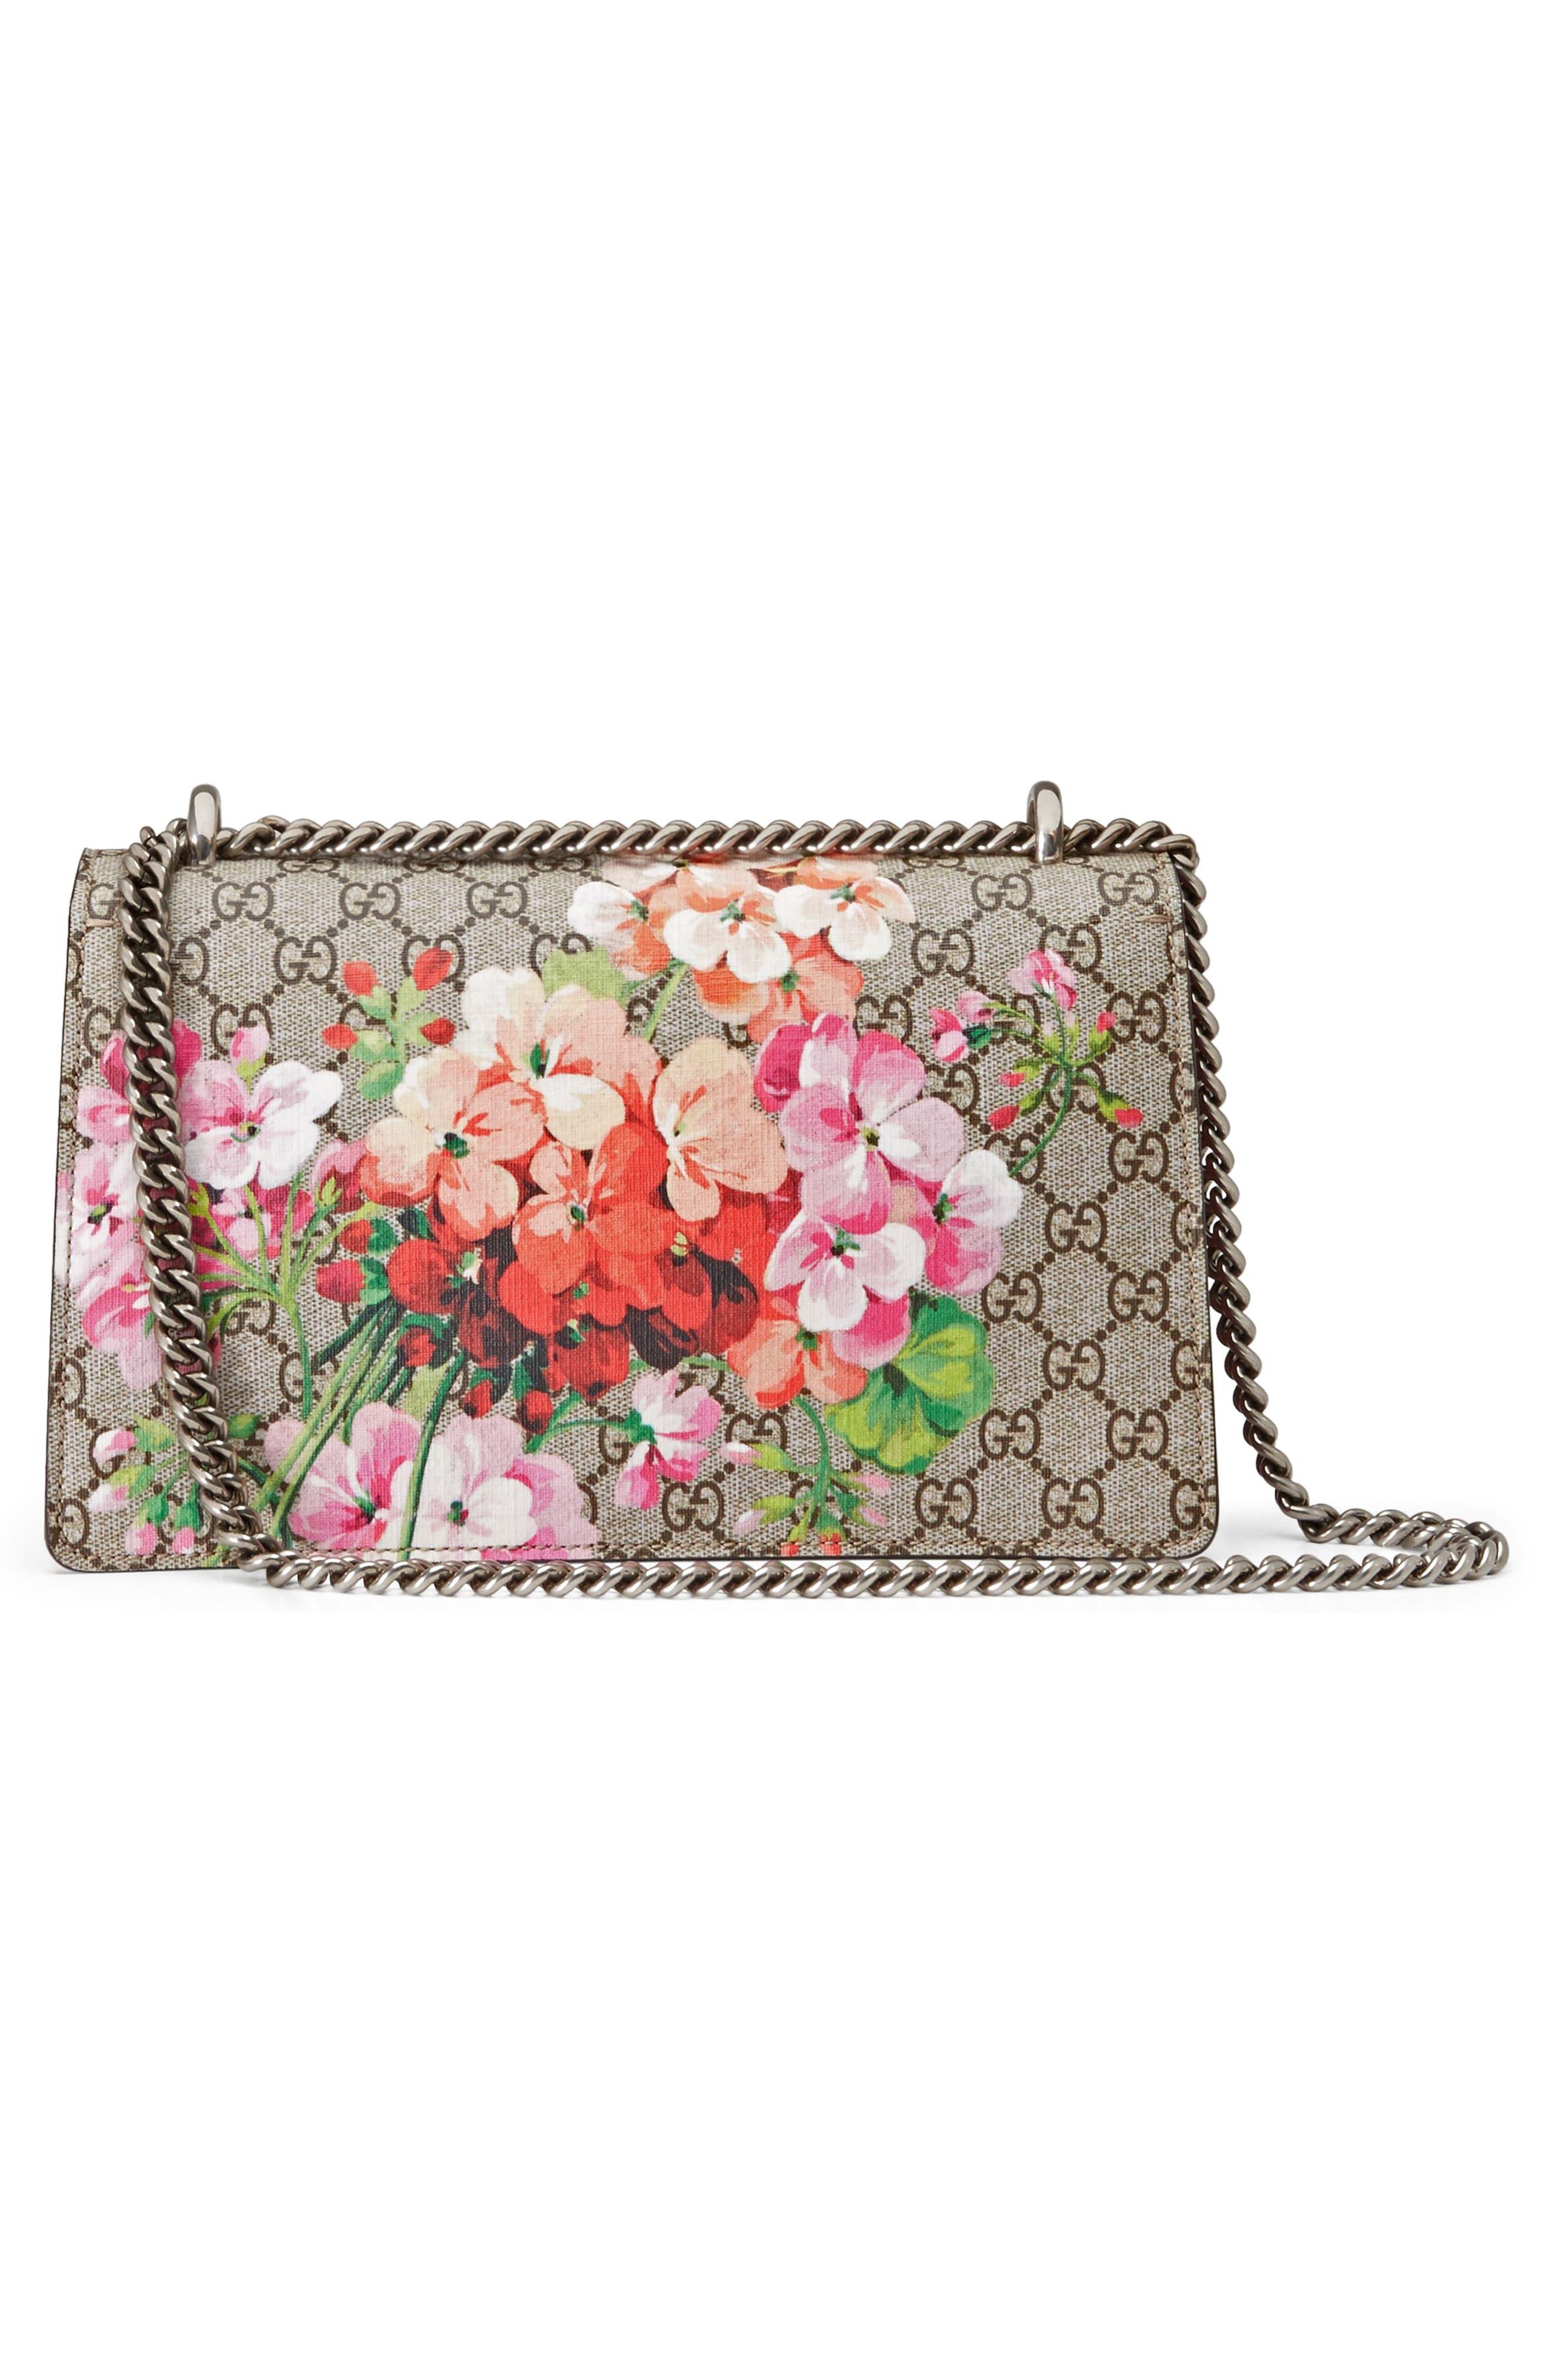 Small Dionysus Floral GG Supreme Canvas Shoulder Bag,                             Alternate thumbnail 2, color,                             Beige Ebony/ Dry Rose